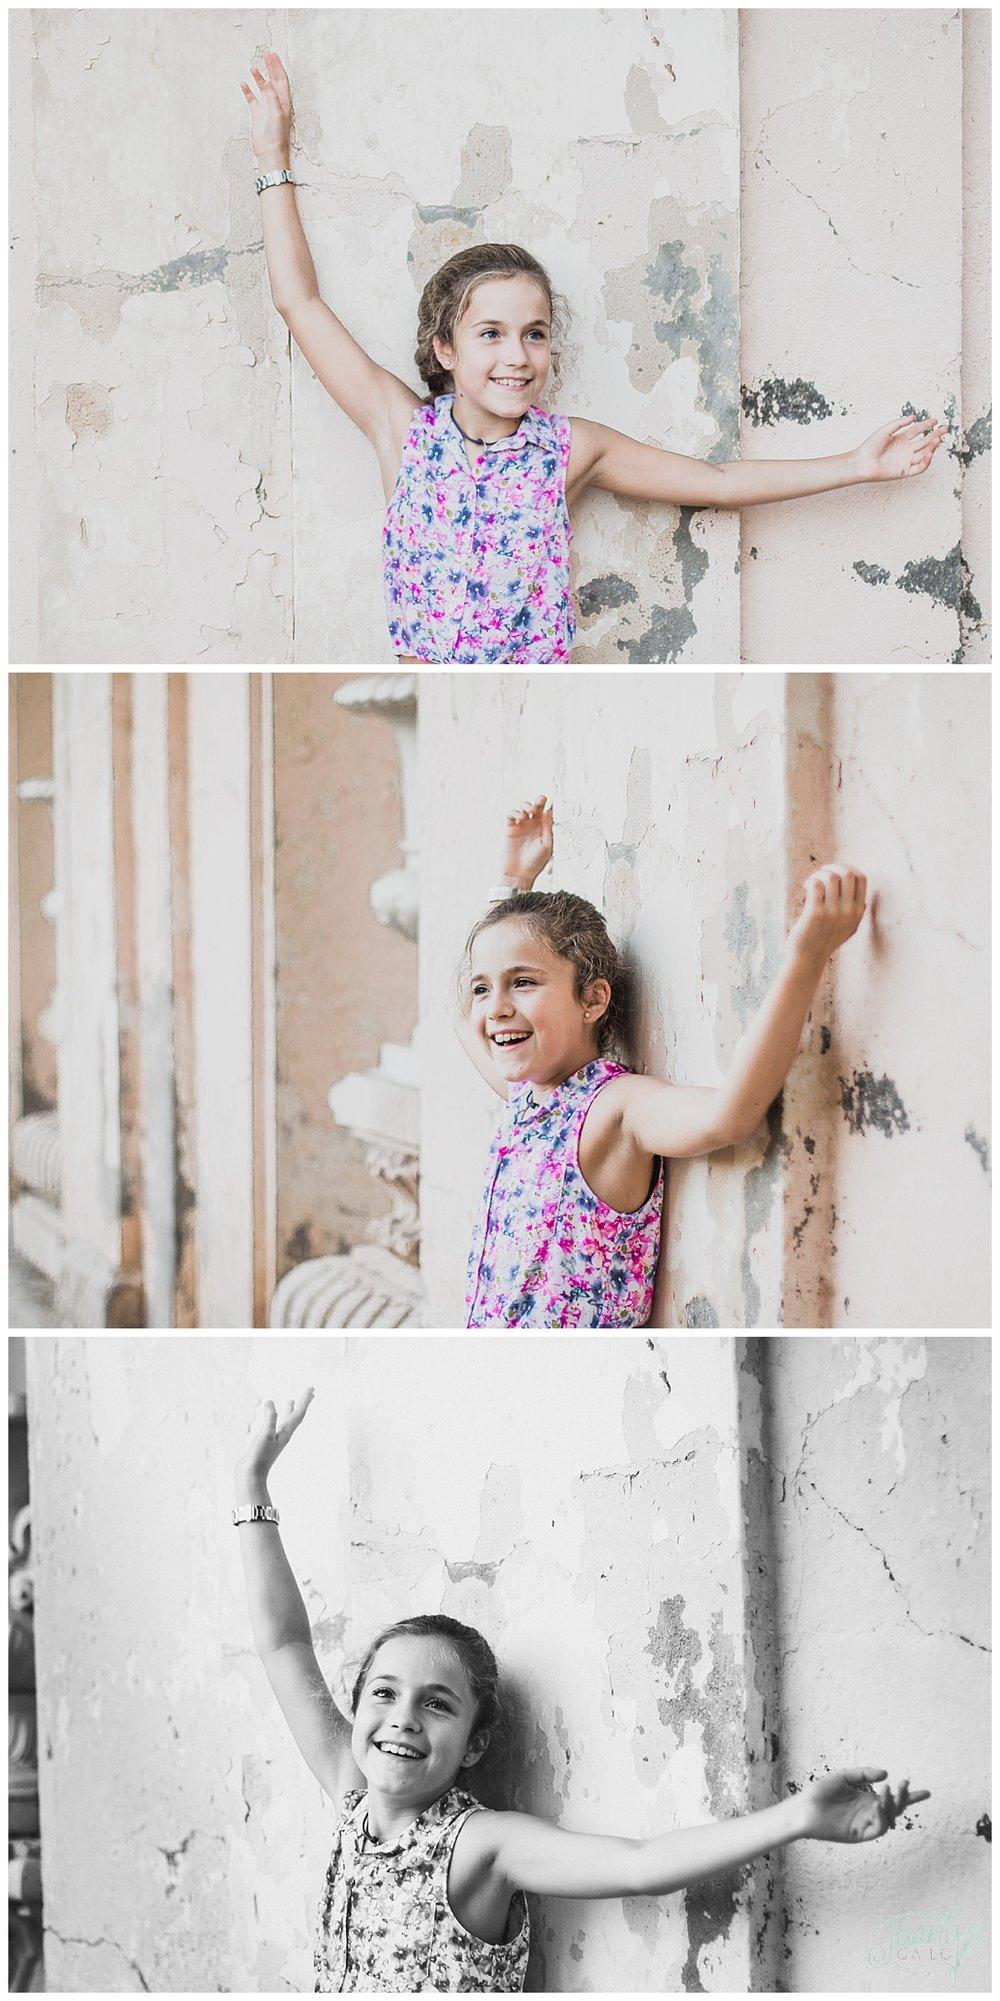 Sesión fotográfica infantil de Mencía_0019.jpg